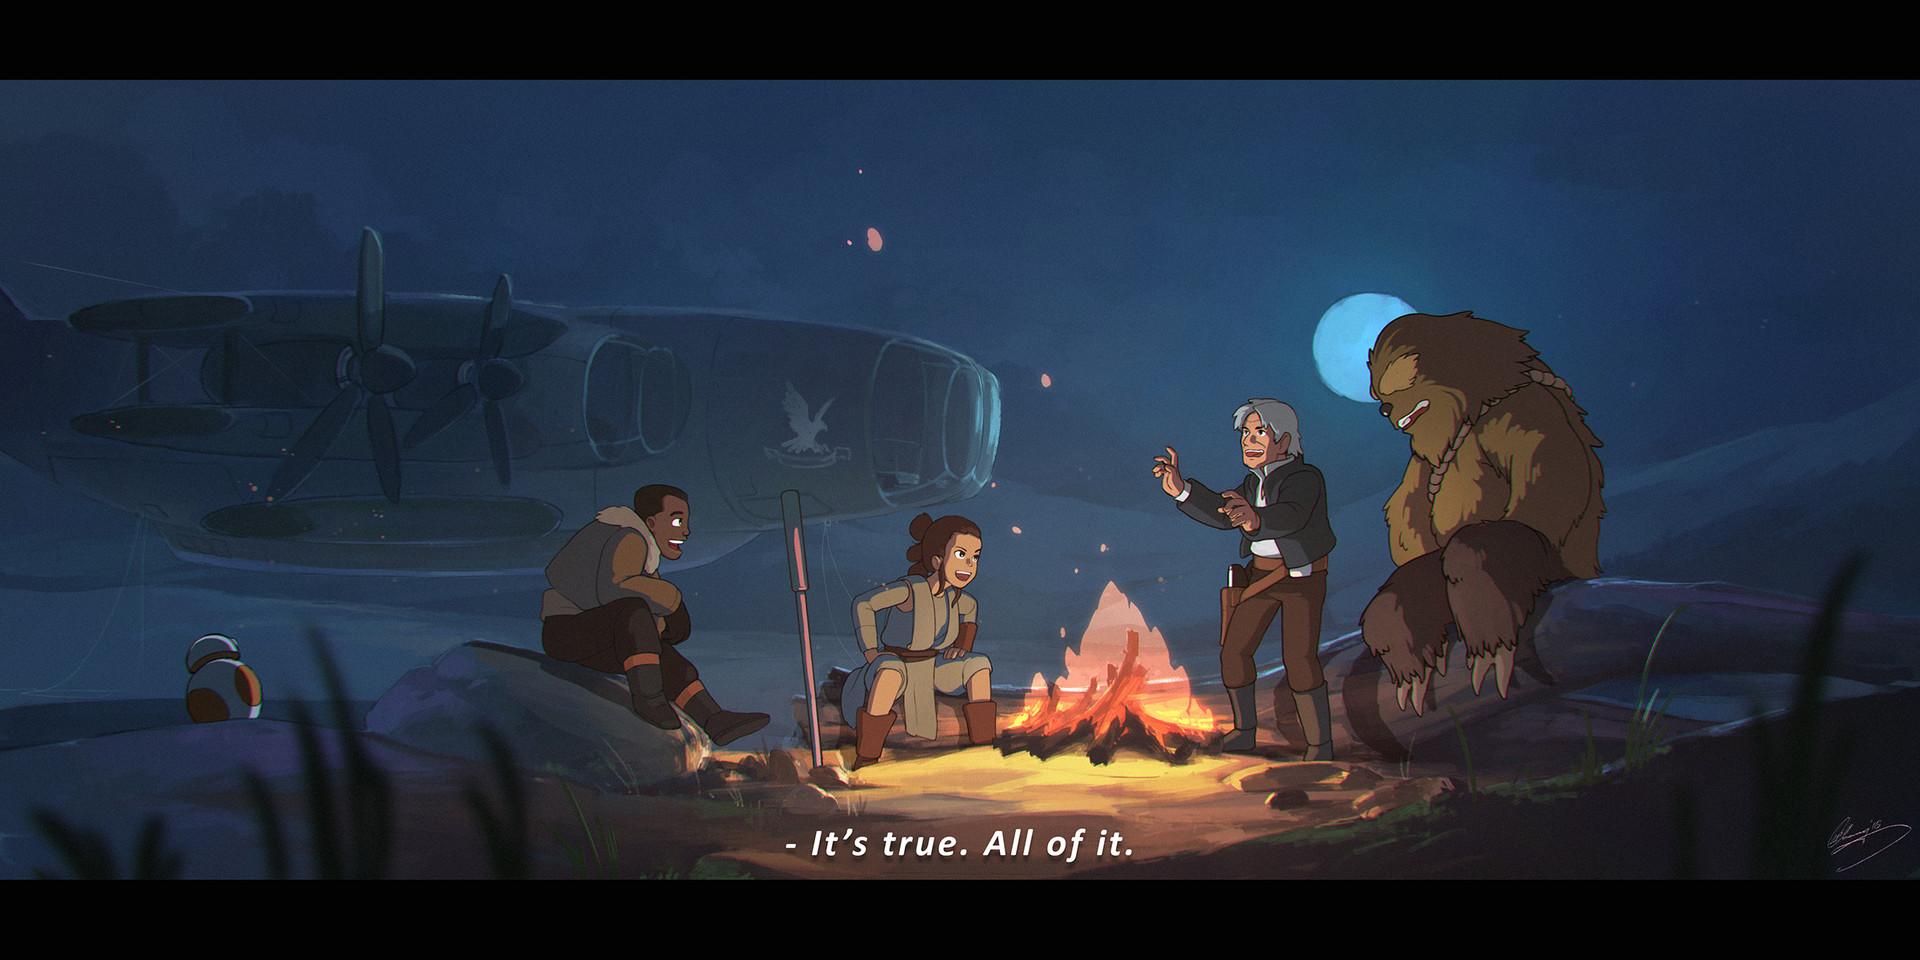 Star Wars vs. Studio Ghibli by Lap Pun Cheung